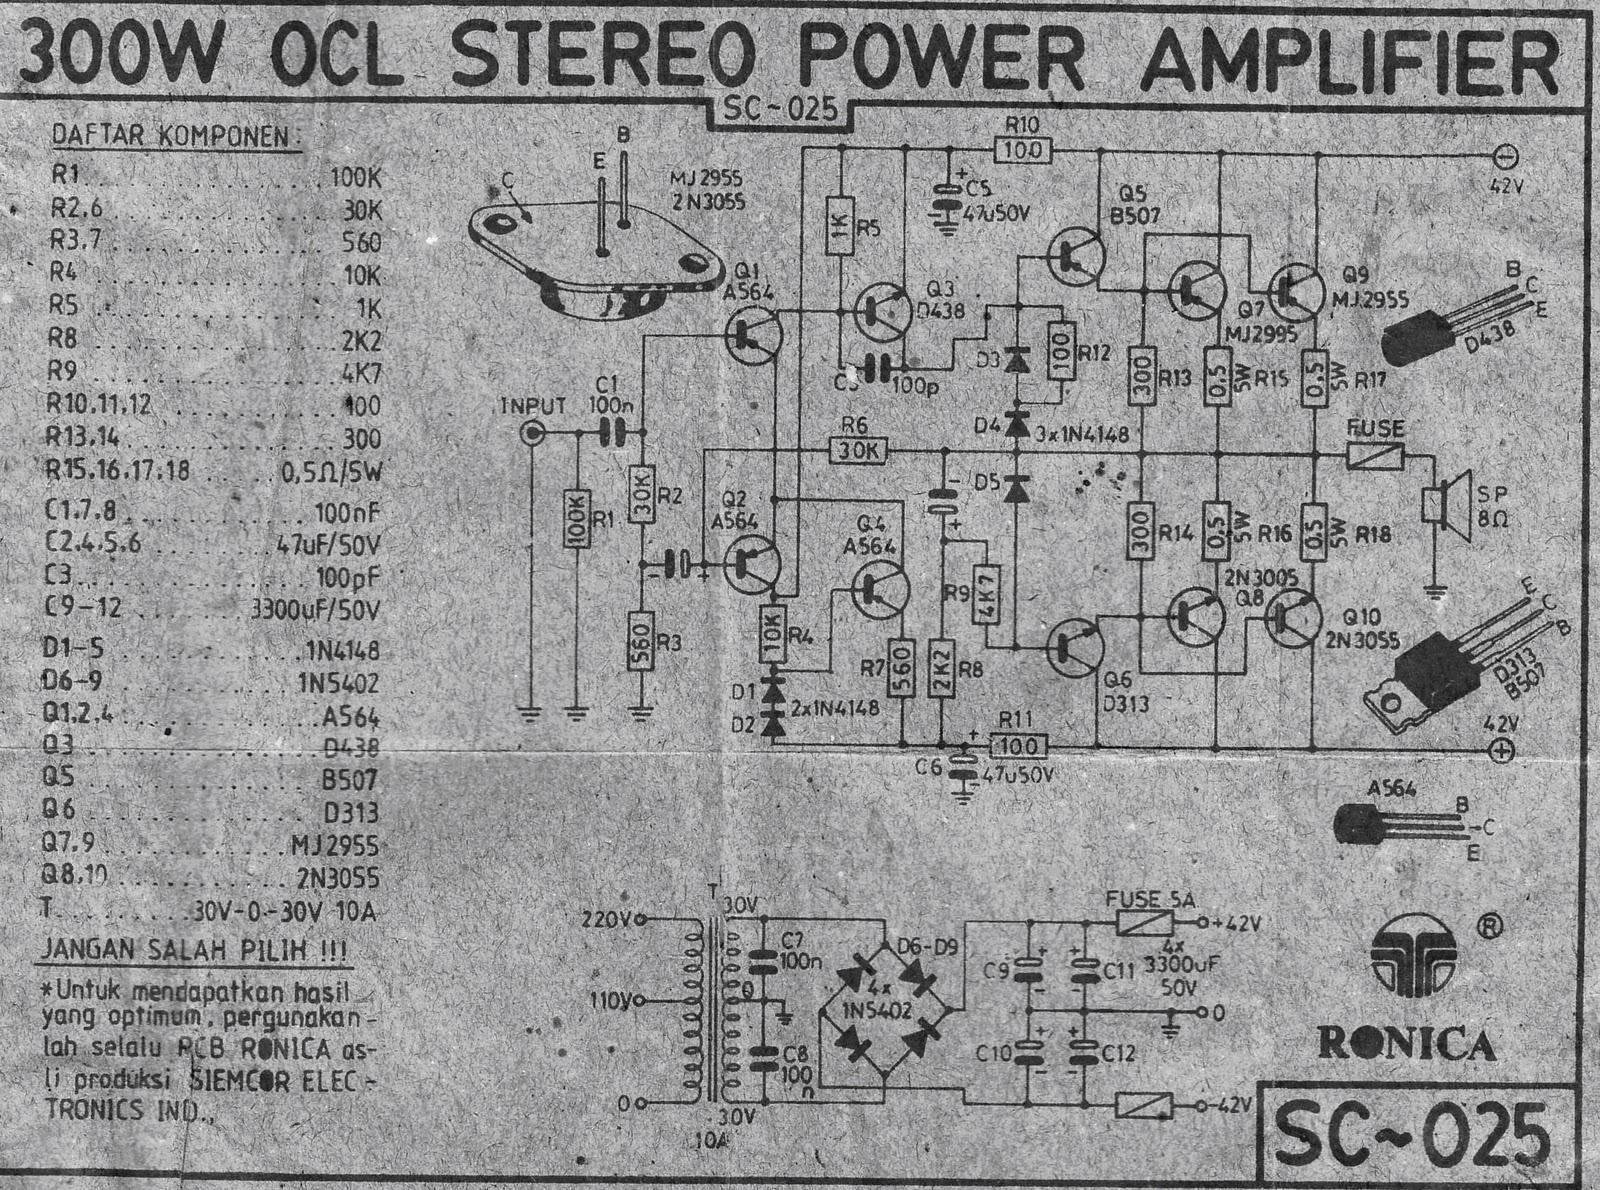 300w power amplifier ocl circuit audiobbm com let s do it simple electric generator diagram http polnischesteinkohleeu [ 1600 x 1190 Pixel ]